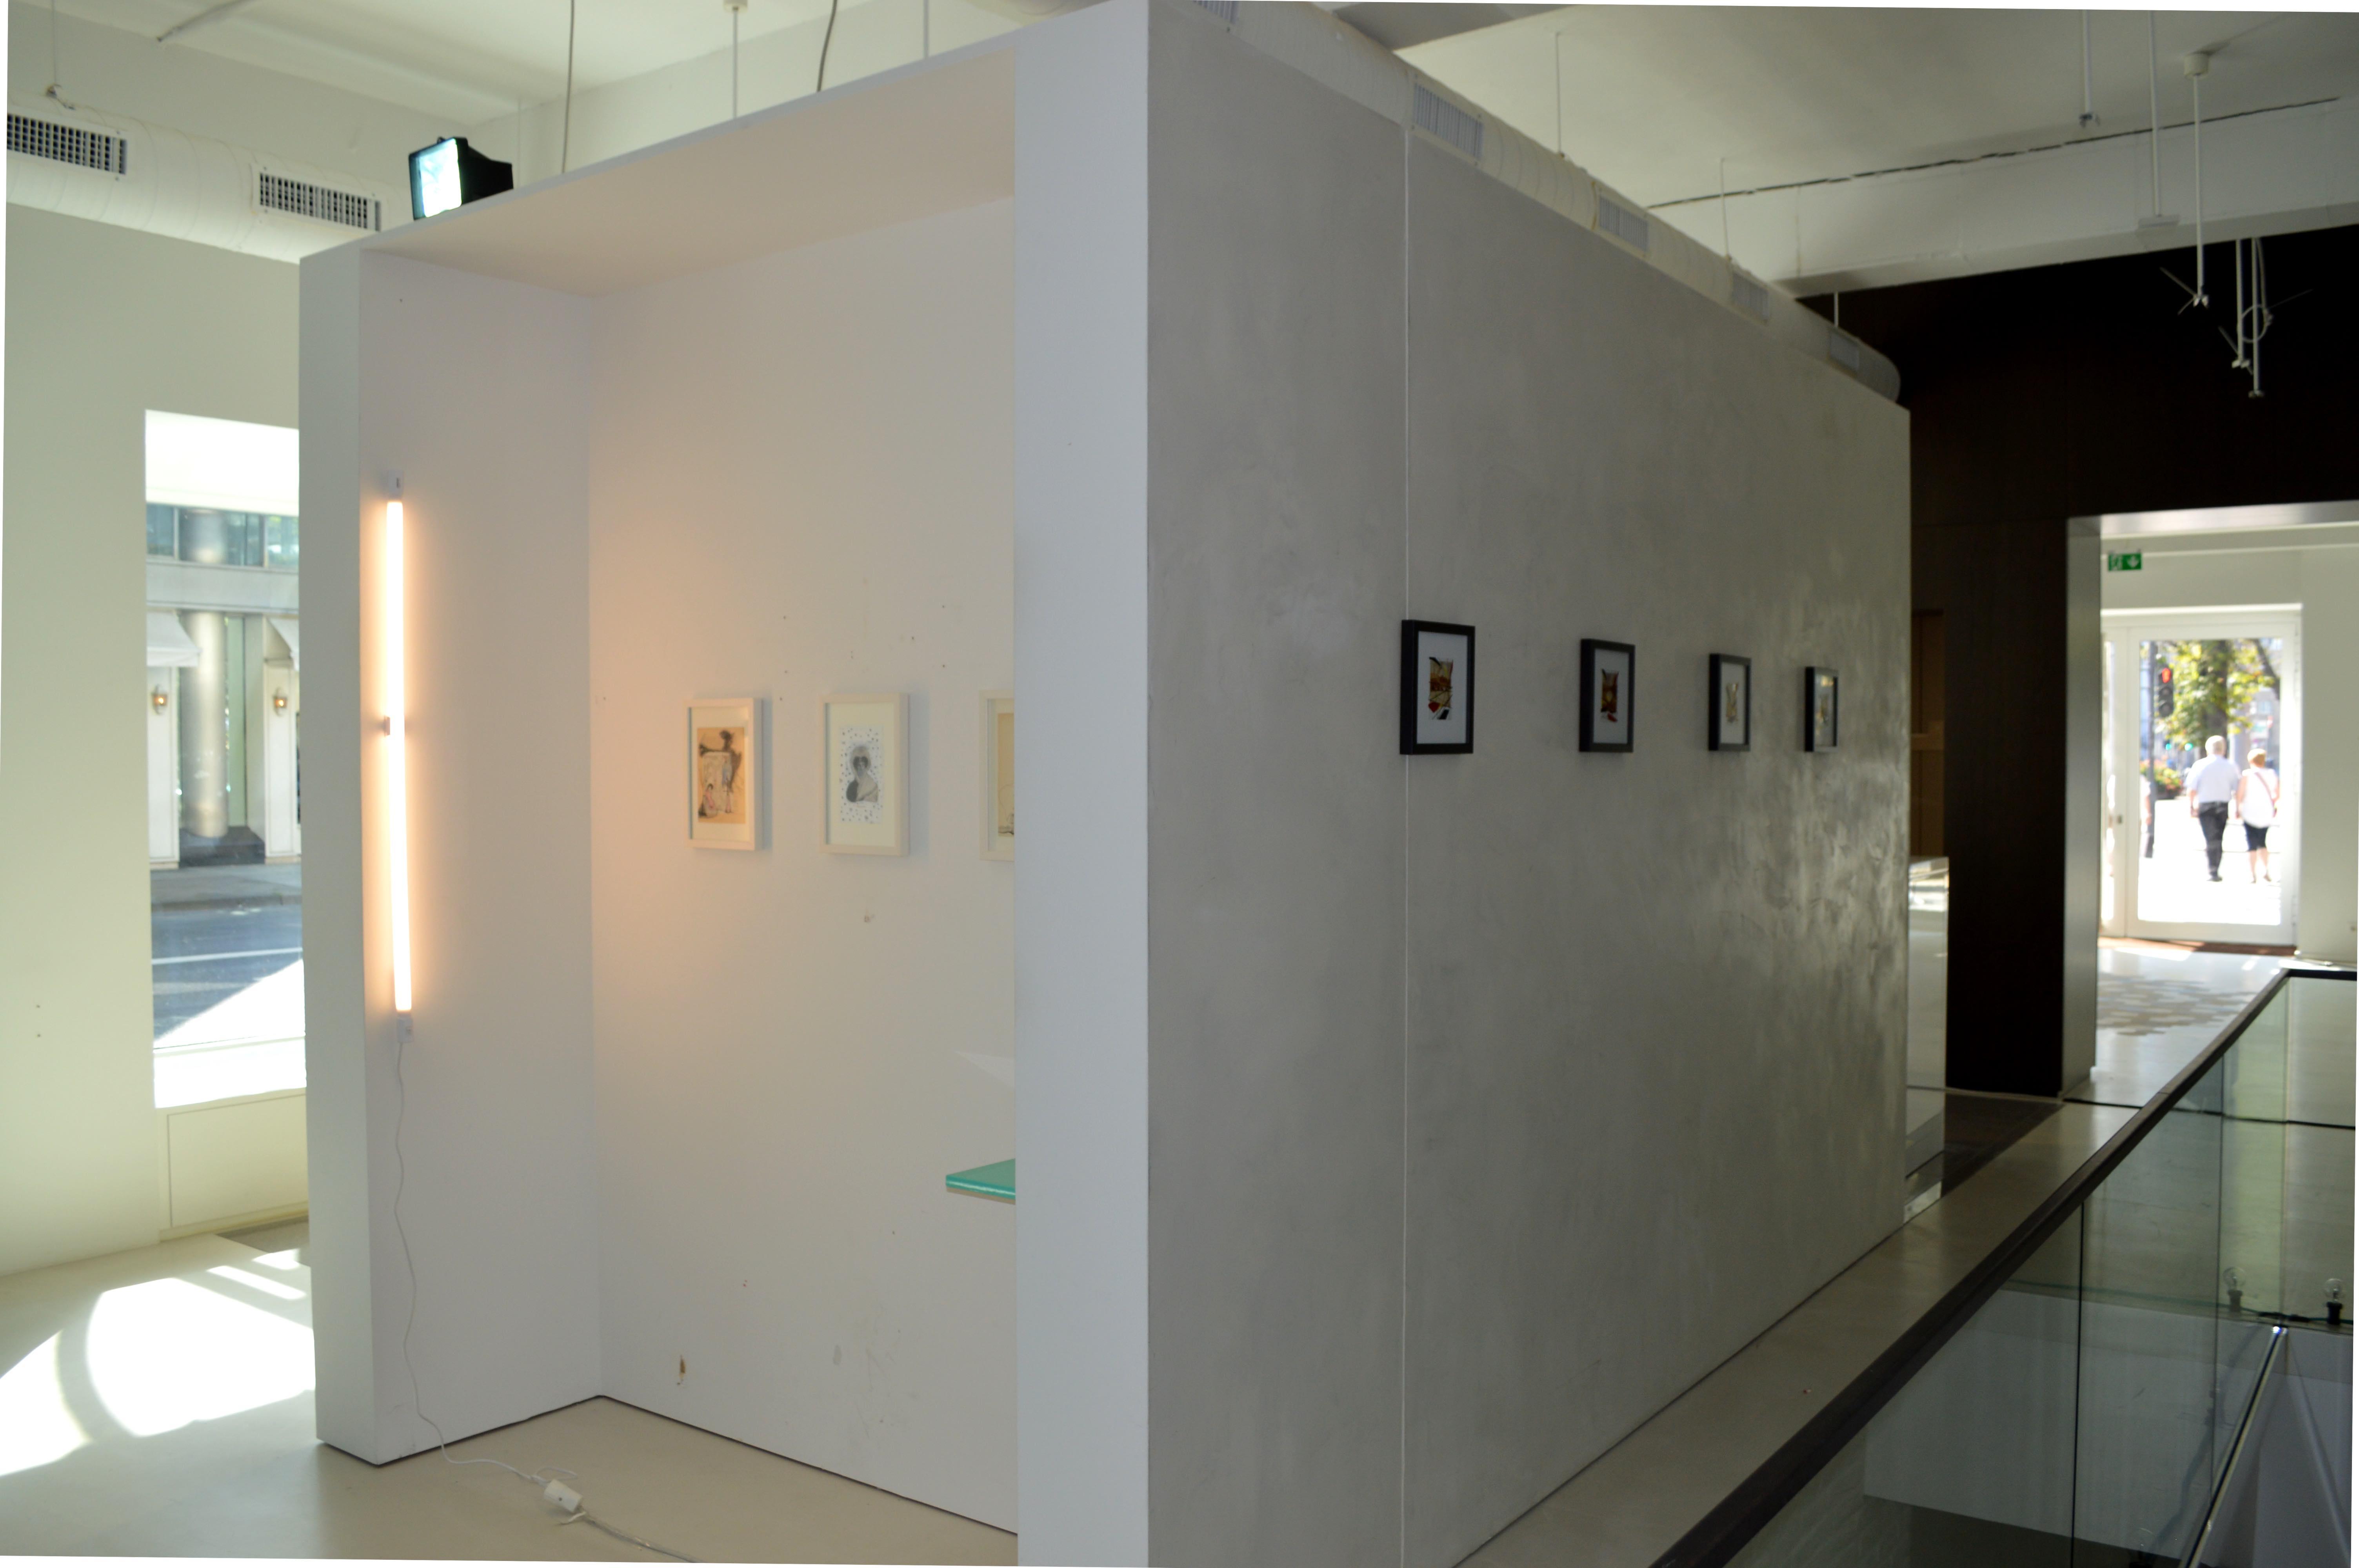 Rachel Libeskind & Anibal Catalan